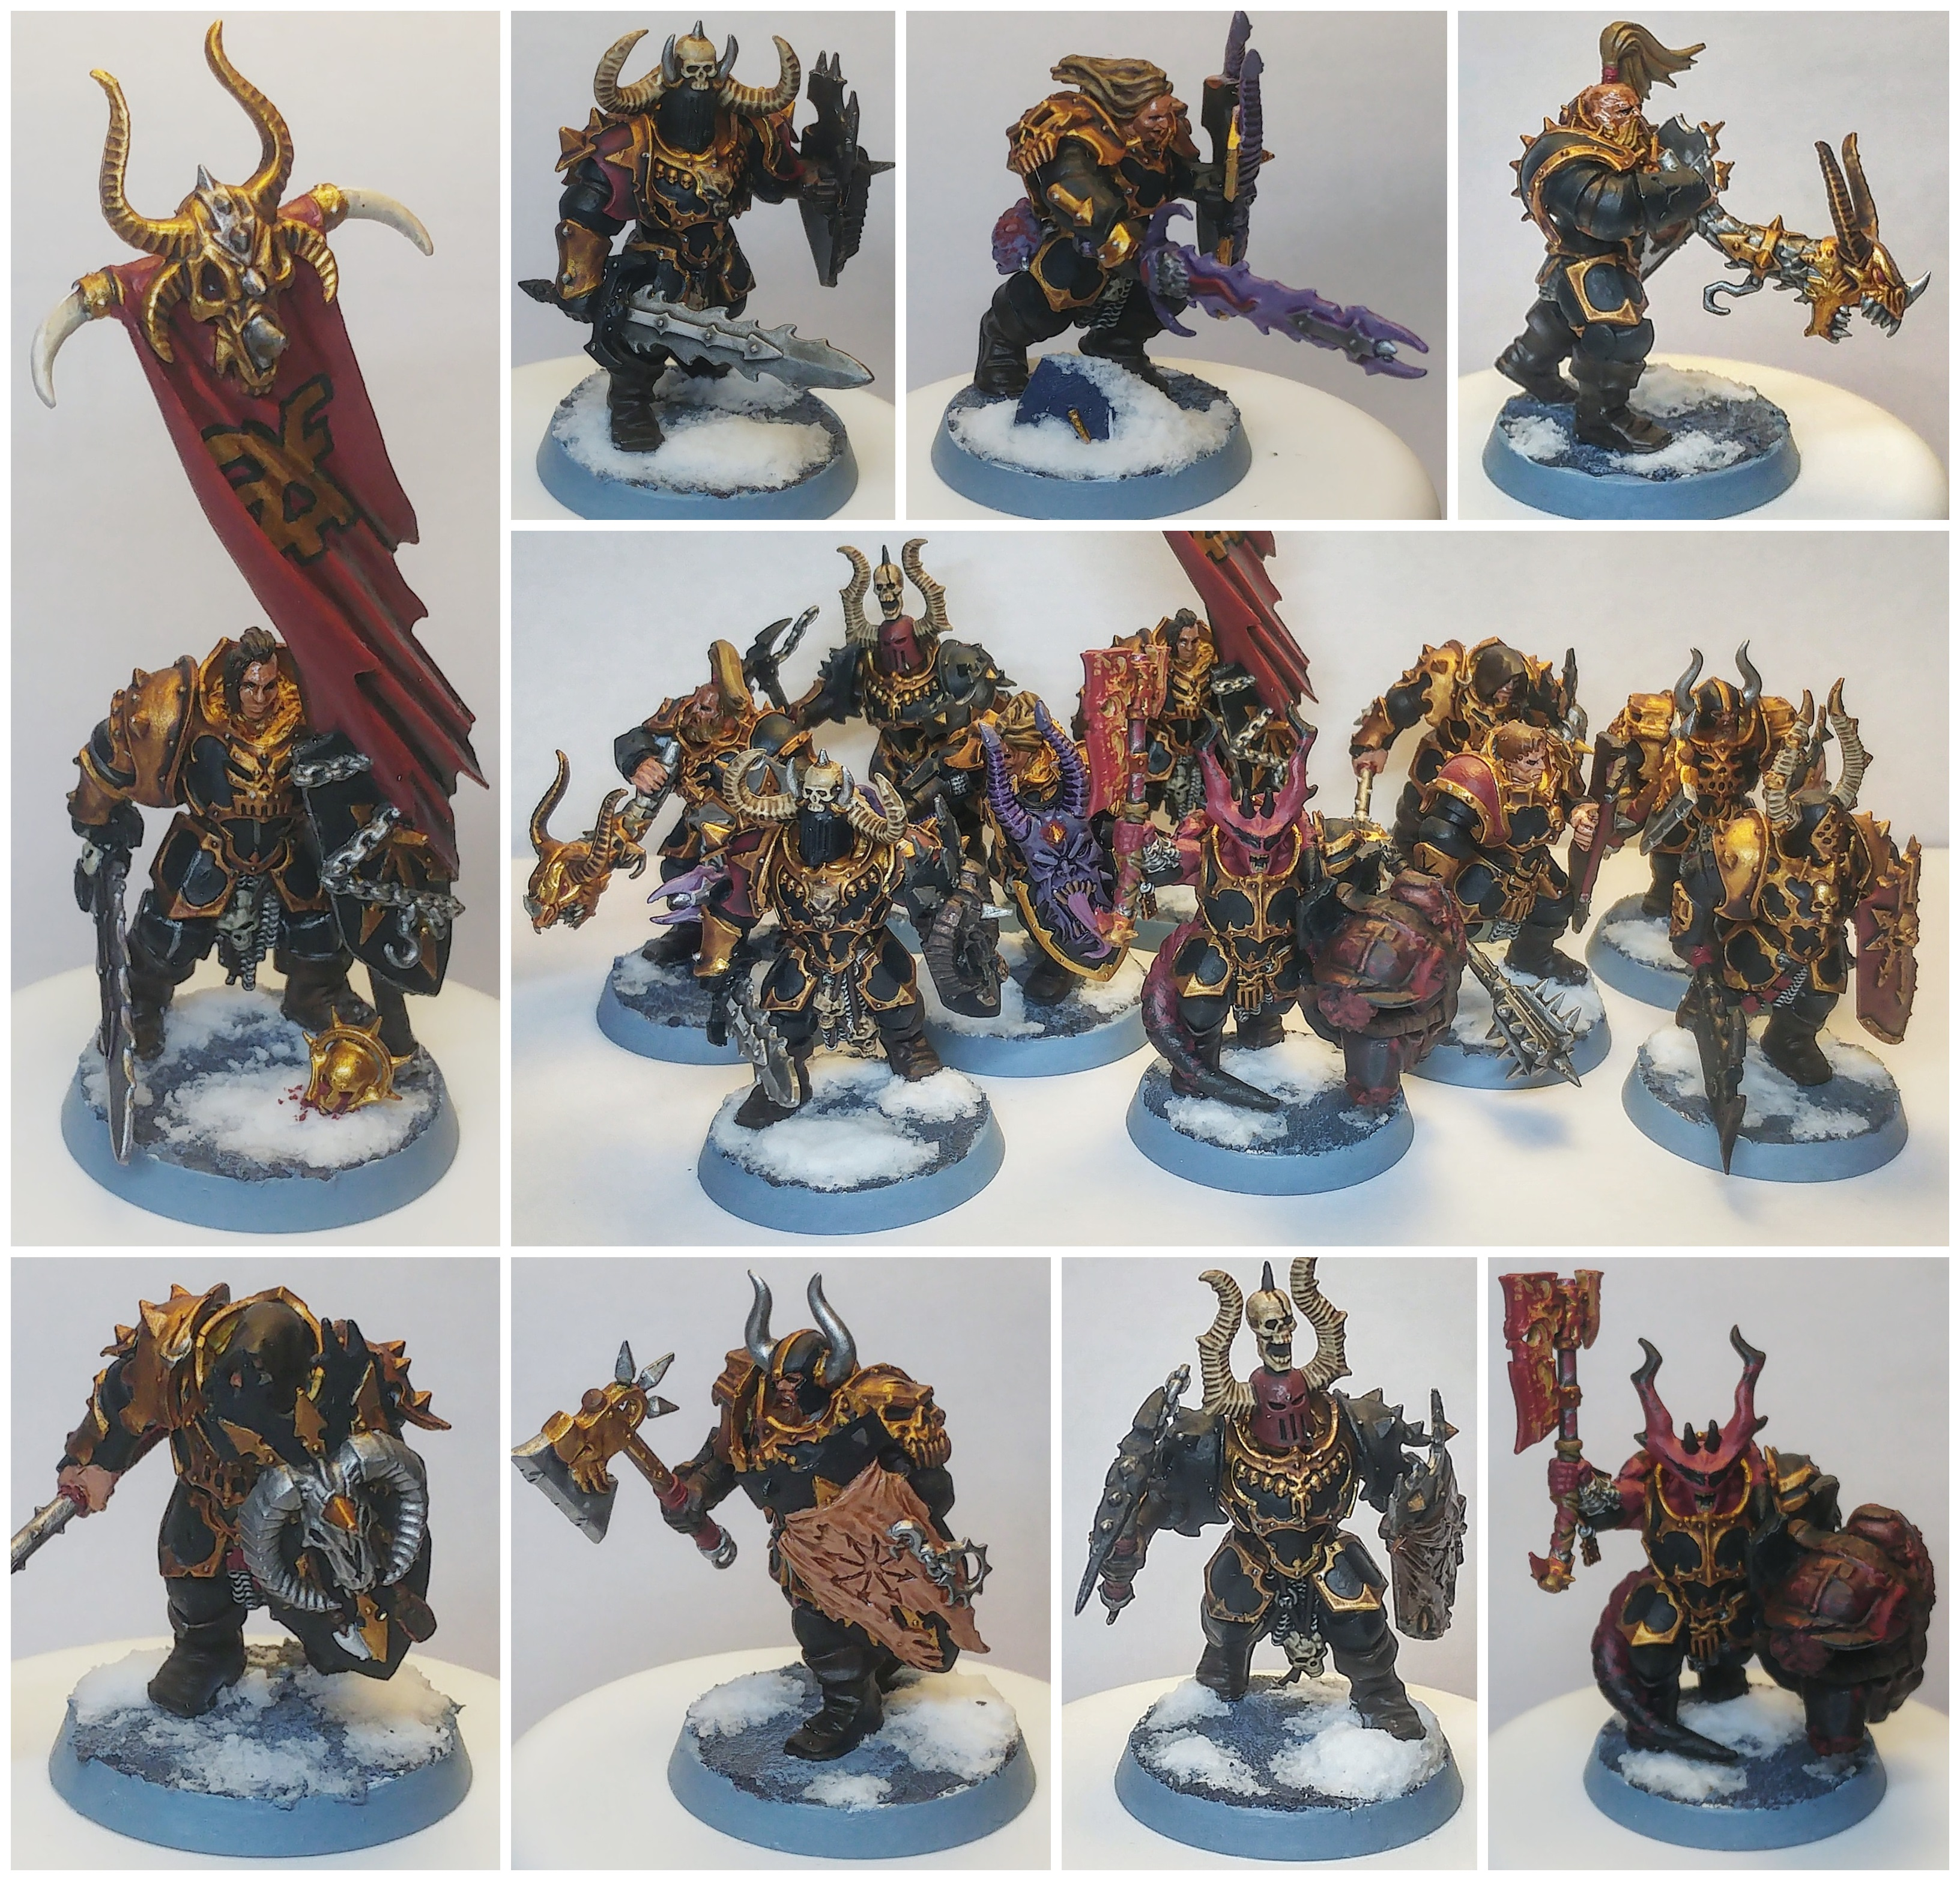 Khorne Chaos Warrior Unit (Converted)